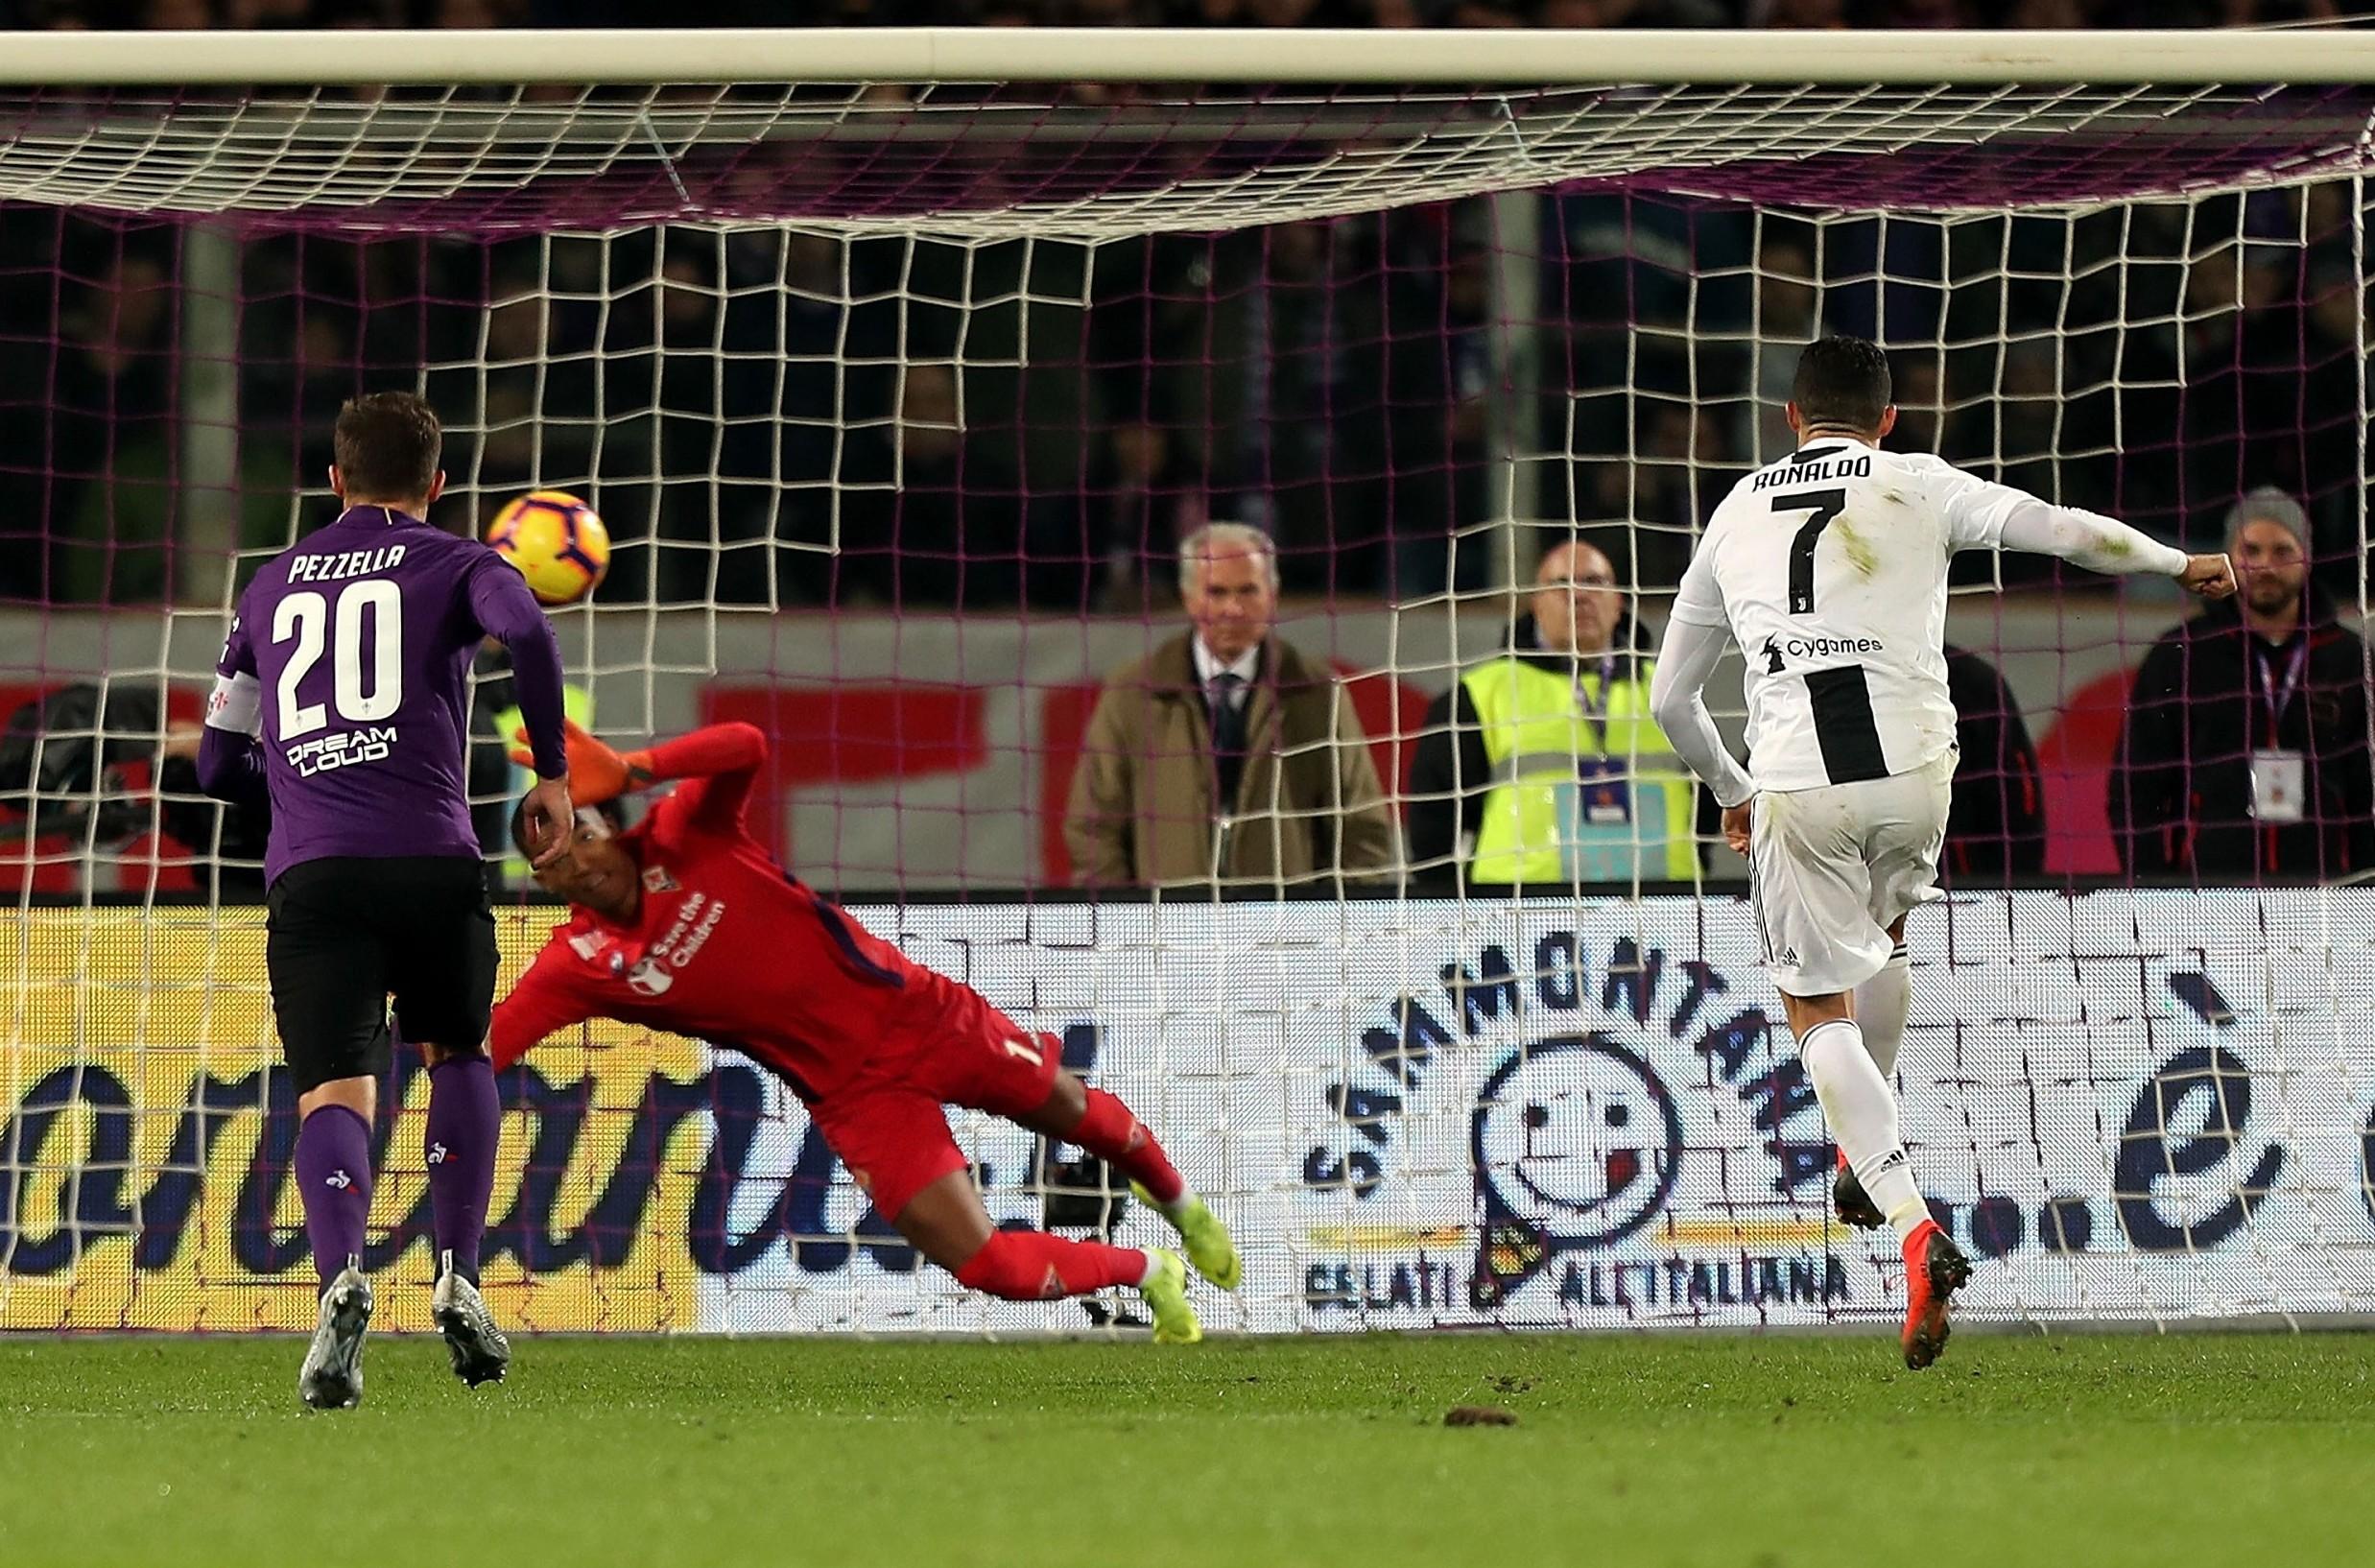 Fiorentina Juventus streaming gratis. Co